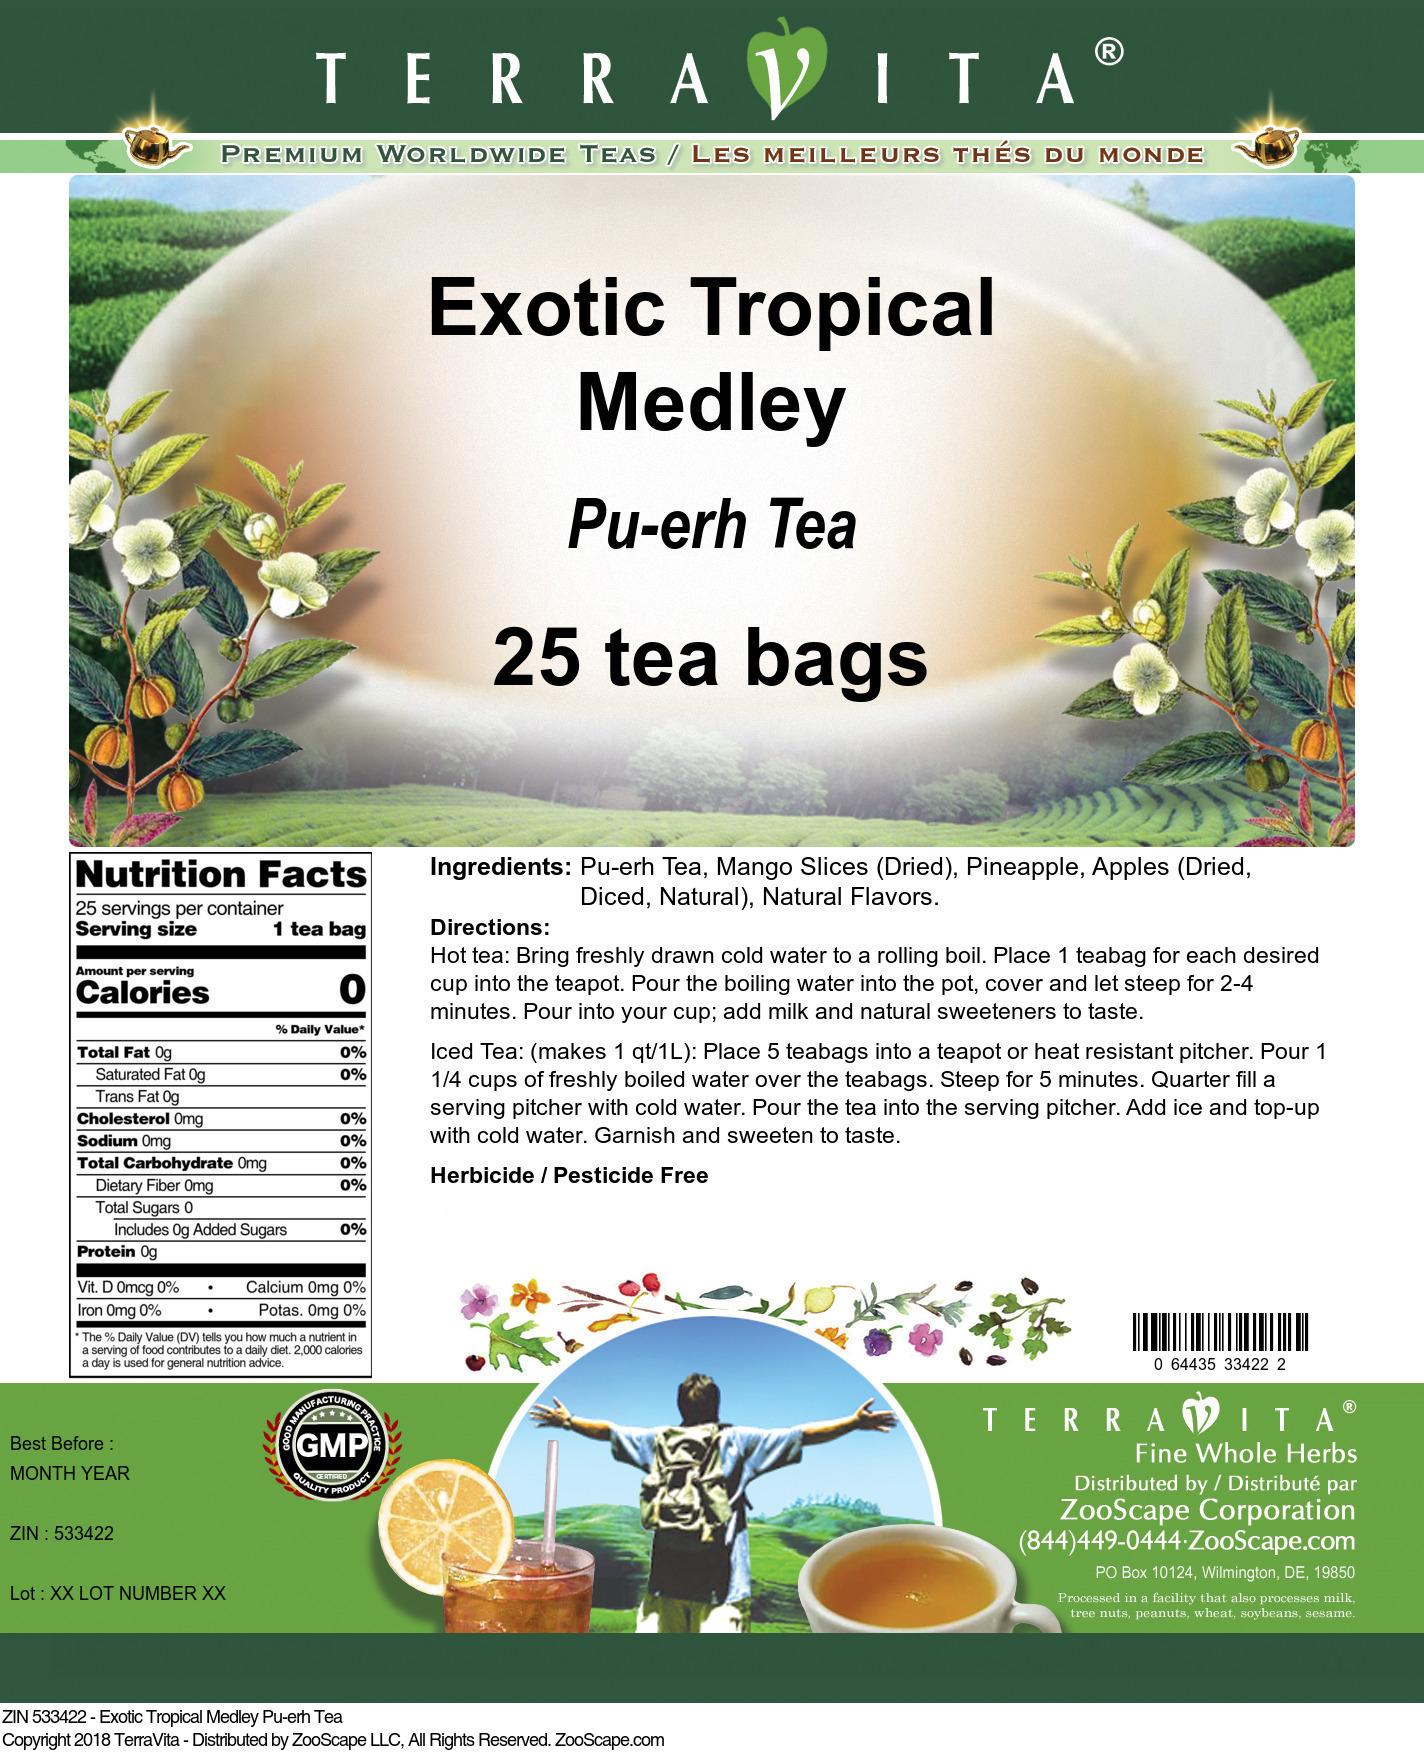 Exotic Tropical Medley Pu-erh Tea